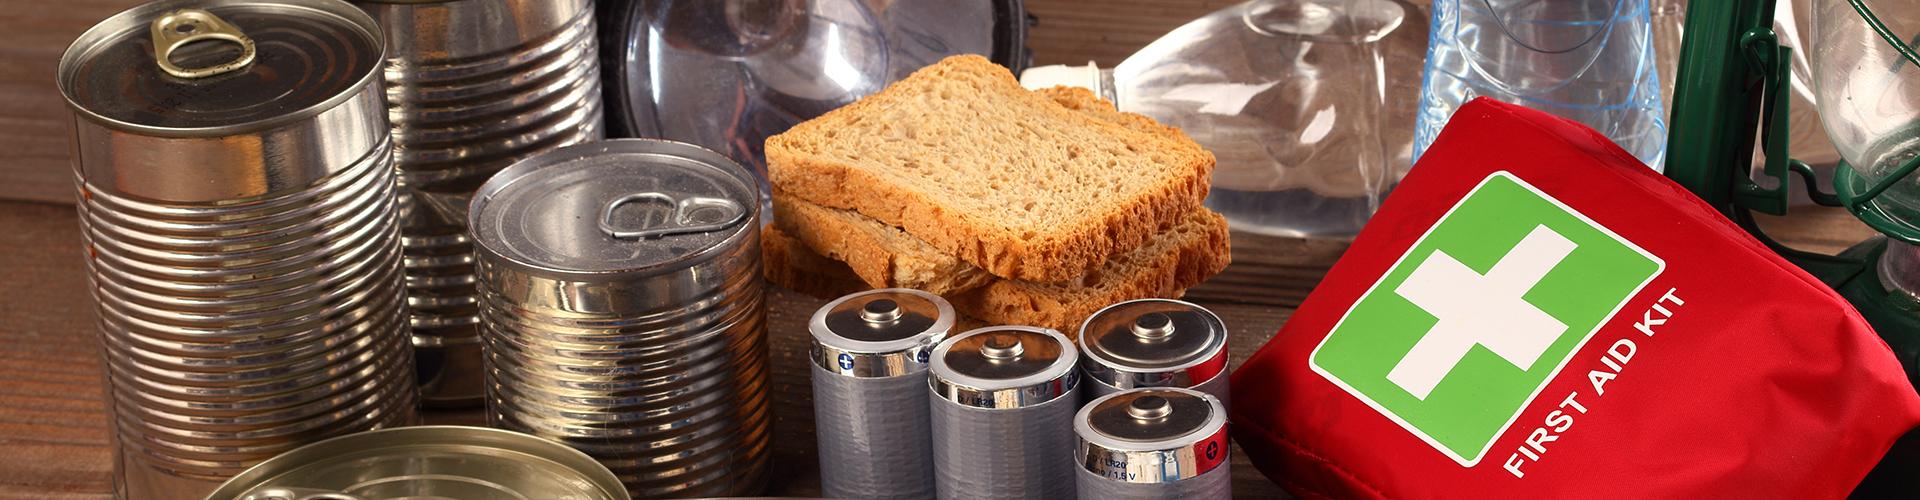 Family Preparedness Kit items